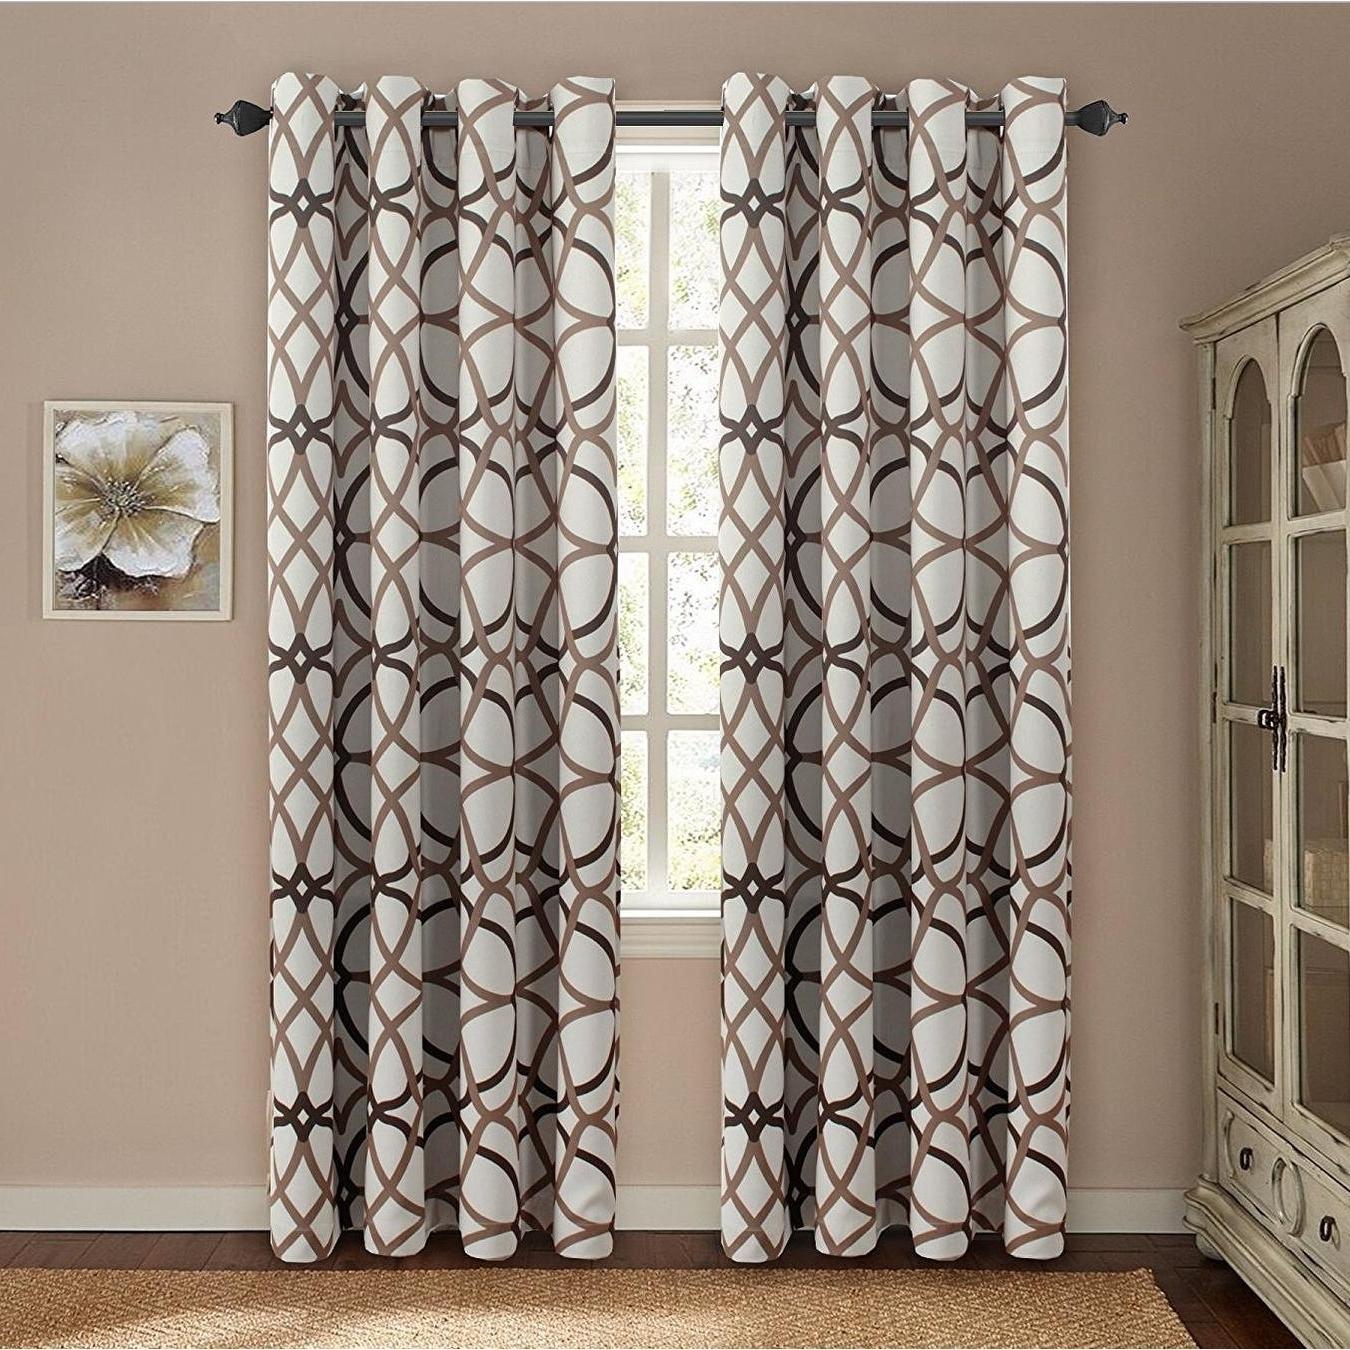 Primebeau Geometric Pattern Blackout Curtain Pair 2 Pack Regarding 2020 Primebeau Geometric Pattern Blackout Curtain Pairs (View 3 of 20)